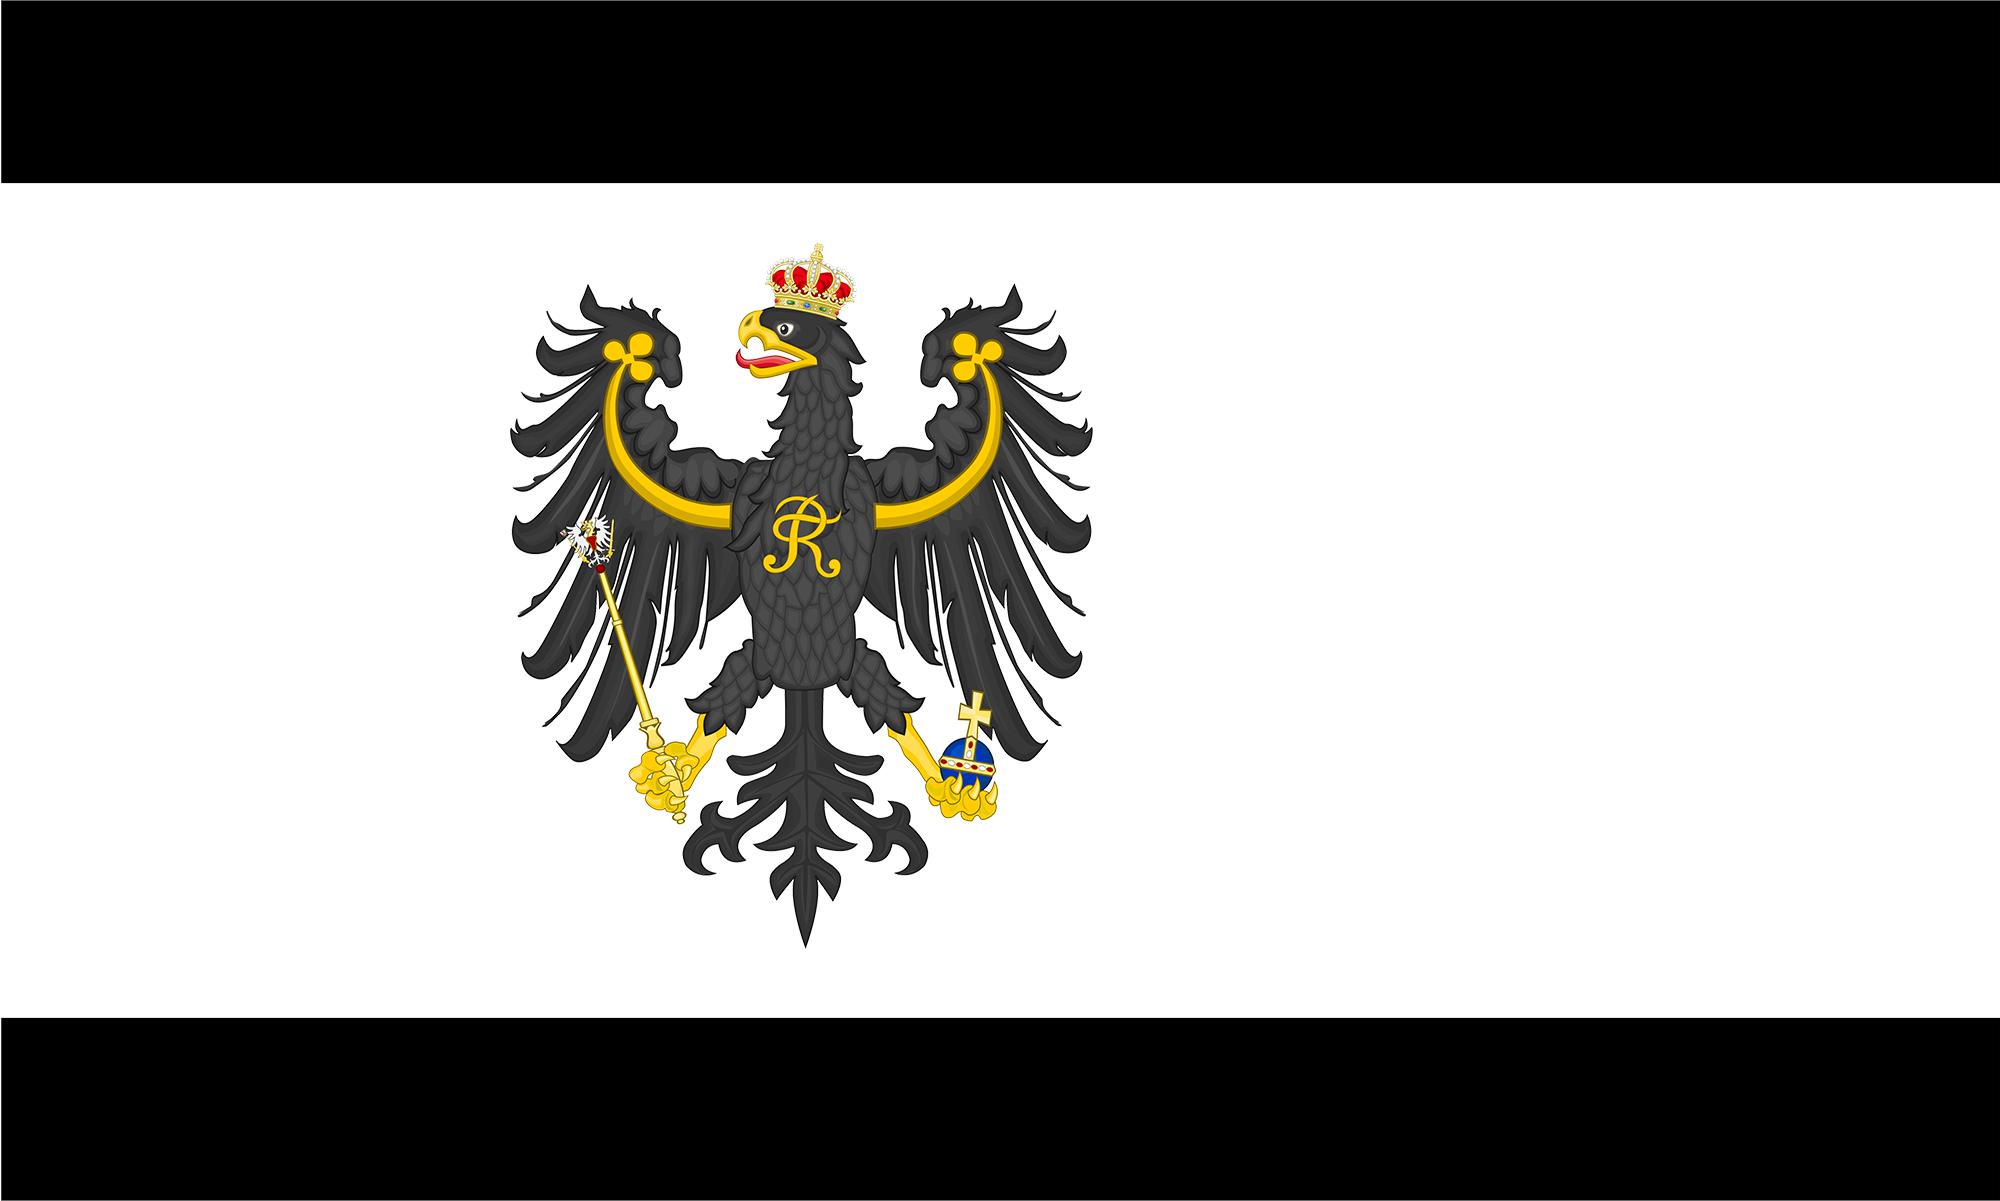 Королевство Пруссия (Свобода, равенство, братство!)